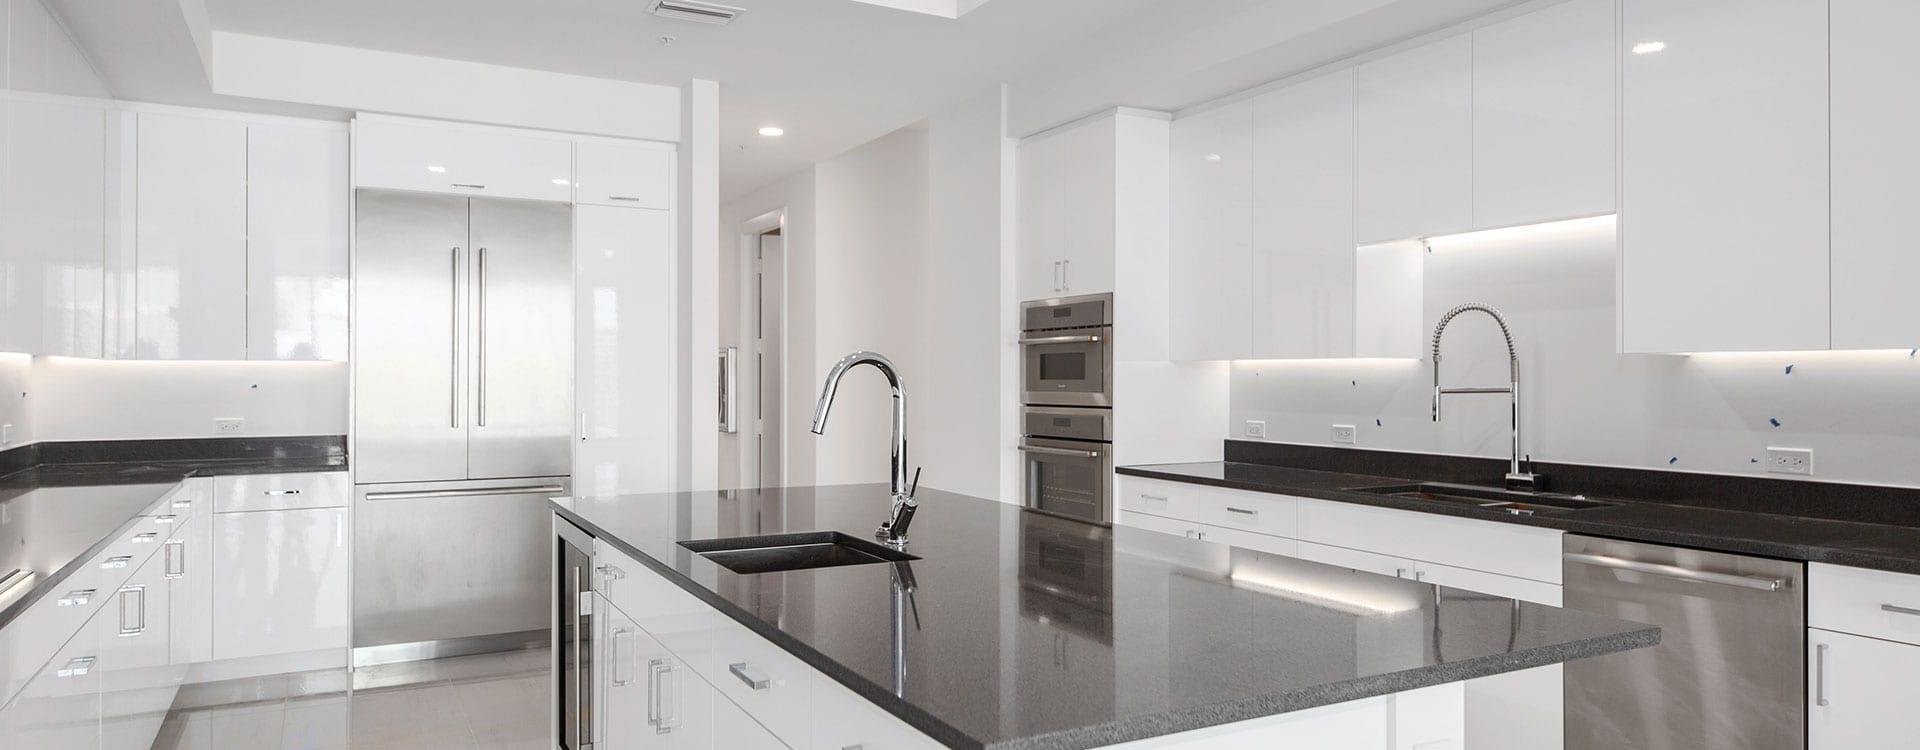 BLVD Residence 903 Kitchen